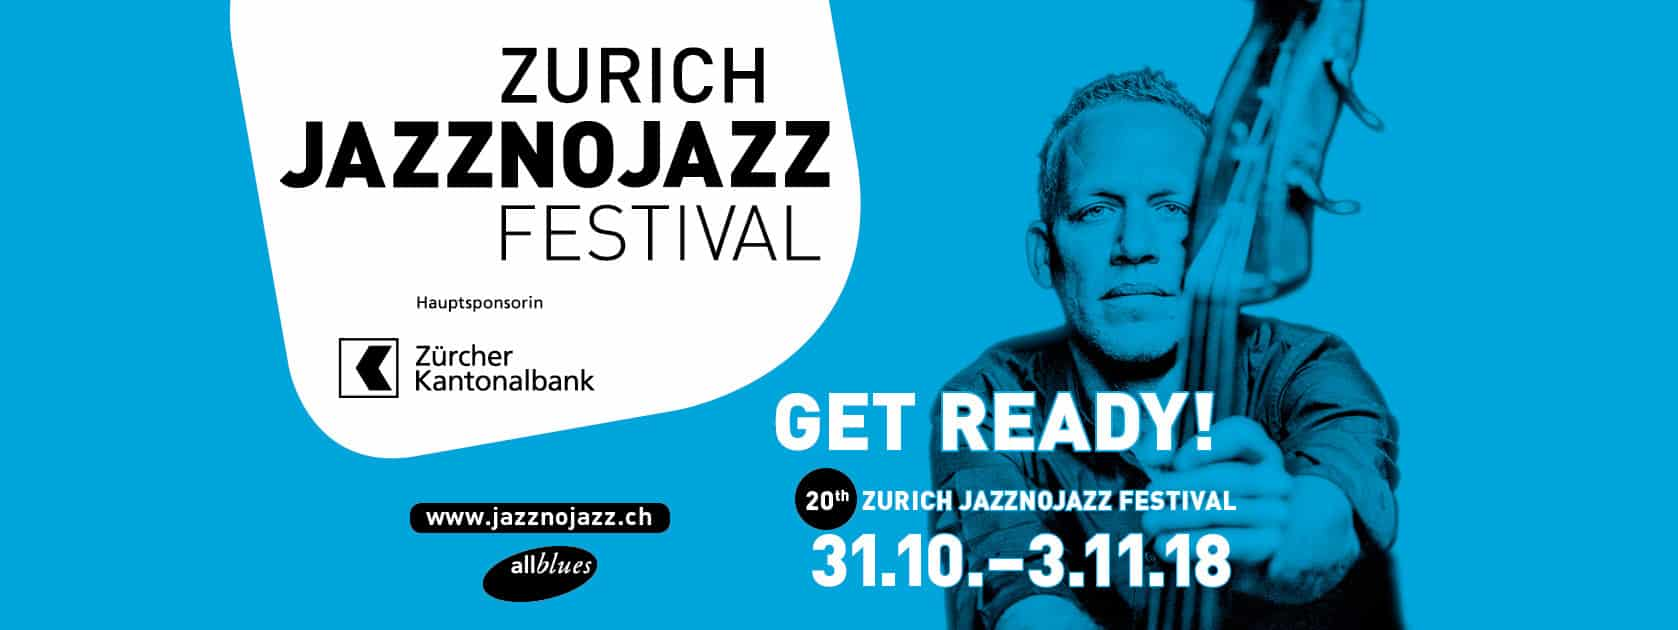 JazzNoJazz Zurich